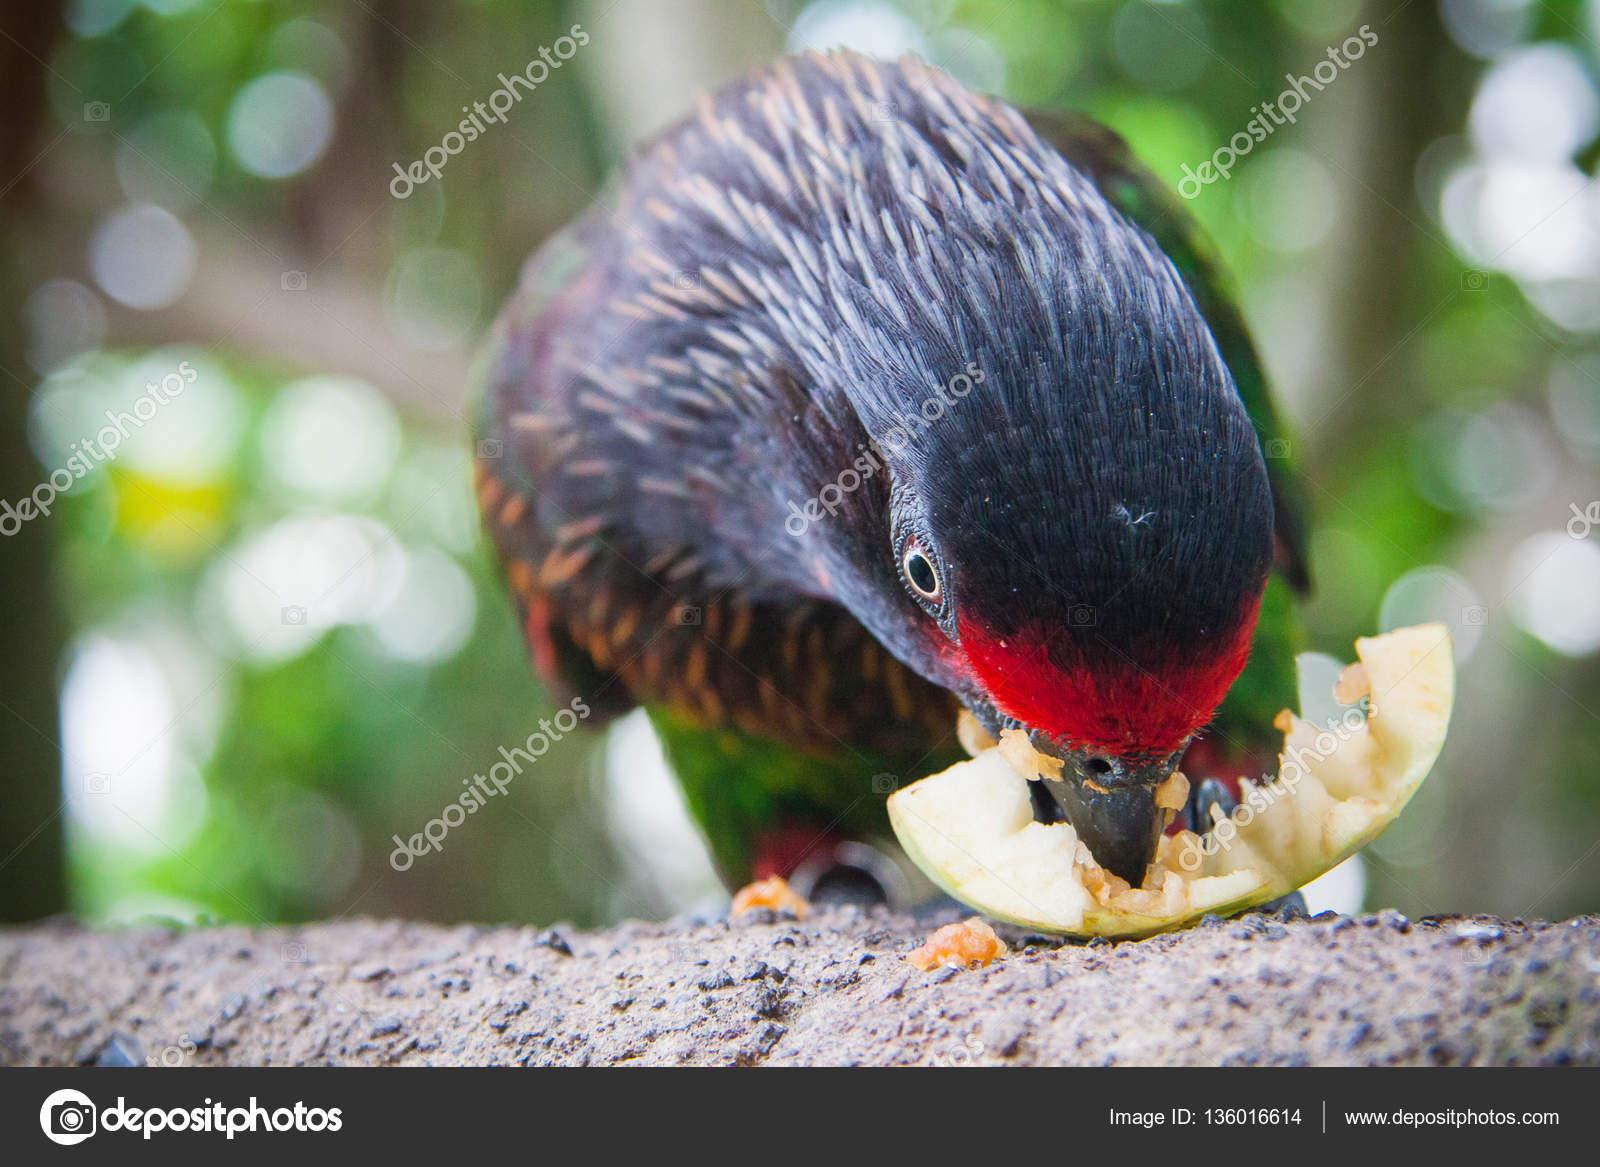 Wildlife In Bali Birds And Reptiles Park Stock Photo C Transurfer